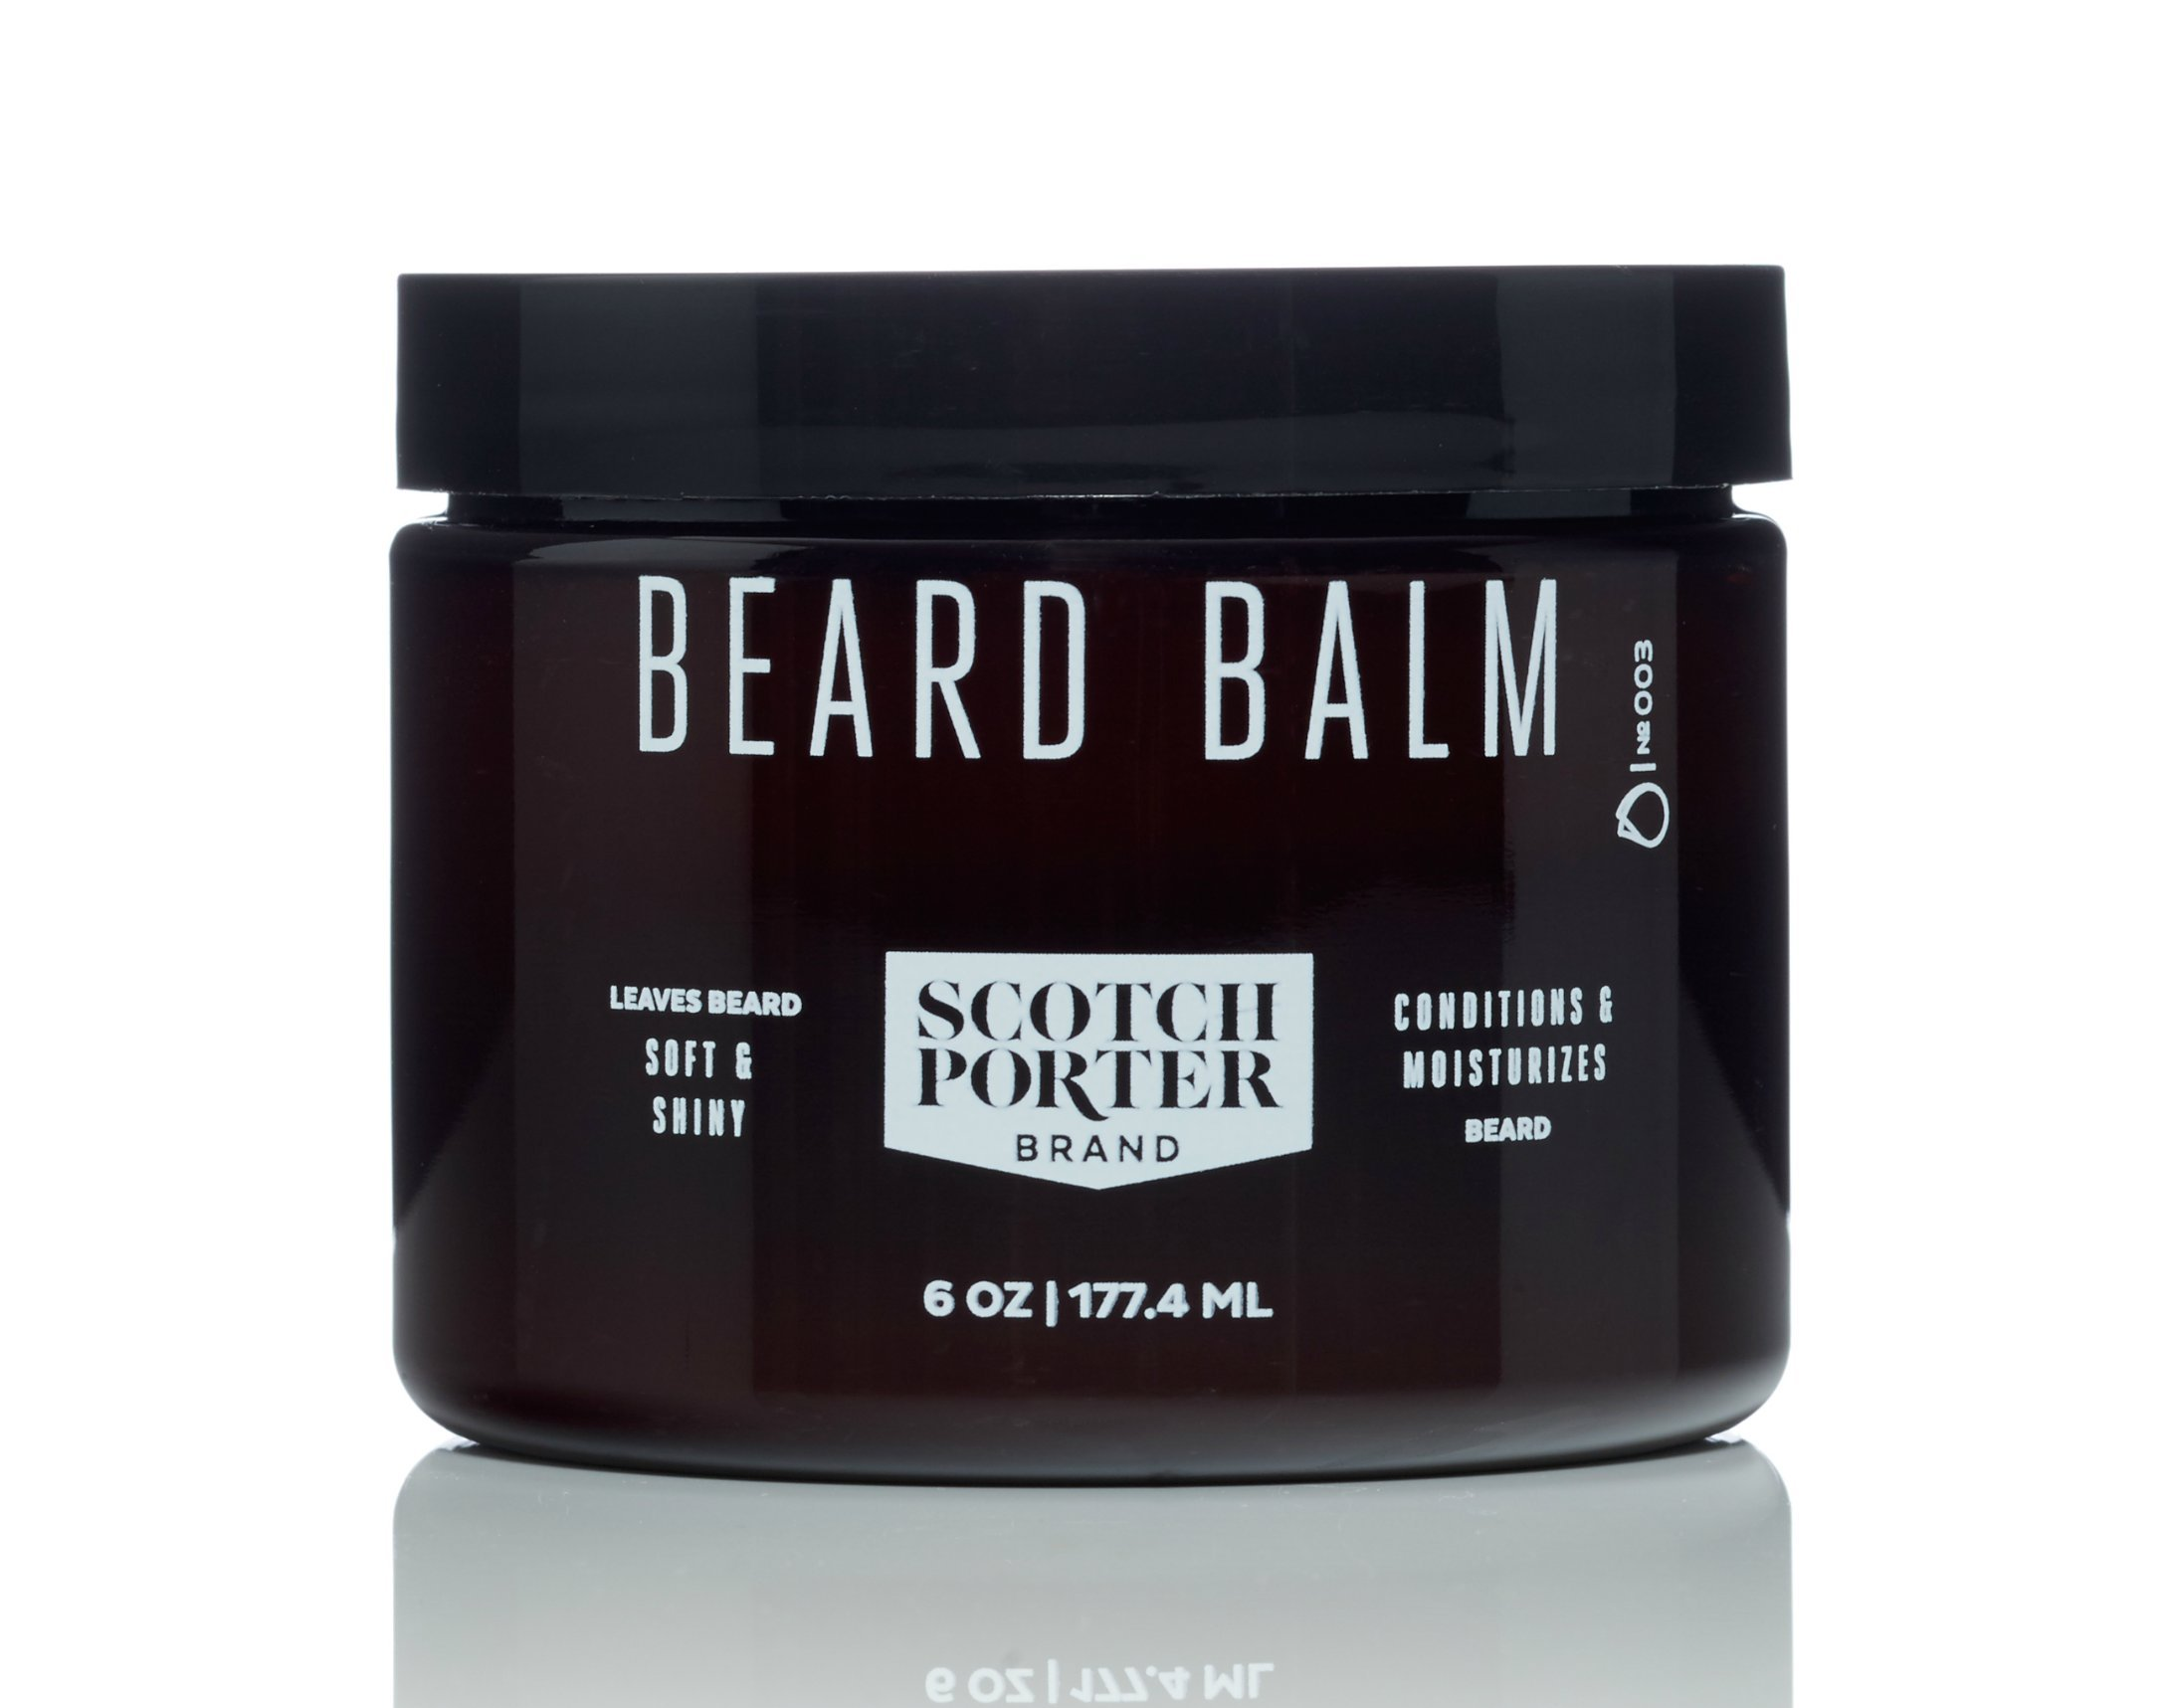 Scotch Porter - All Natural Men's Beard Balm - 6 oz.